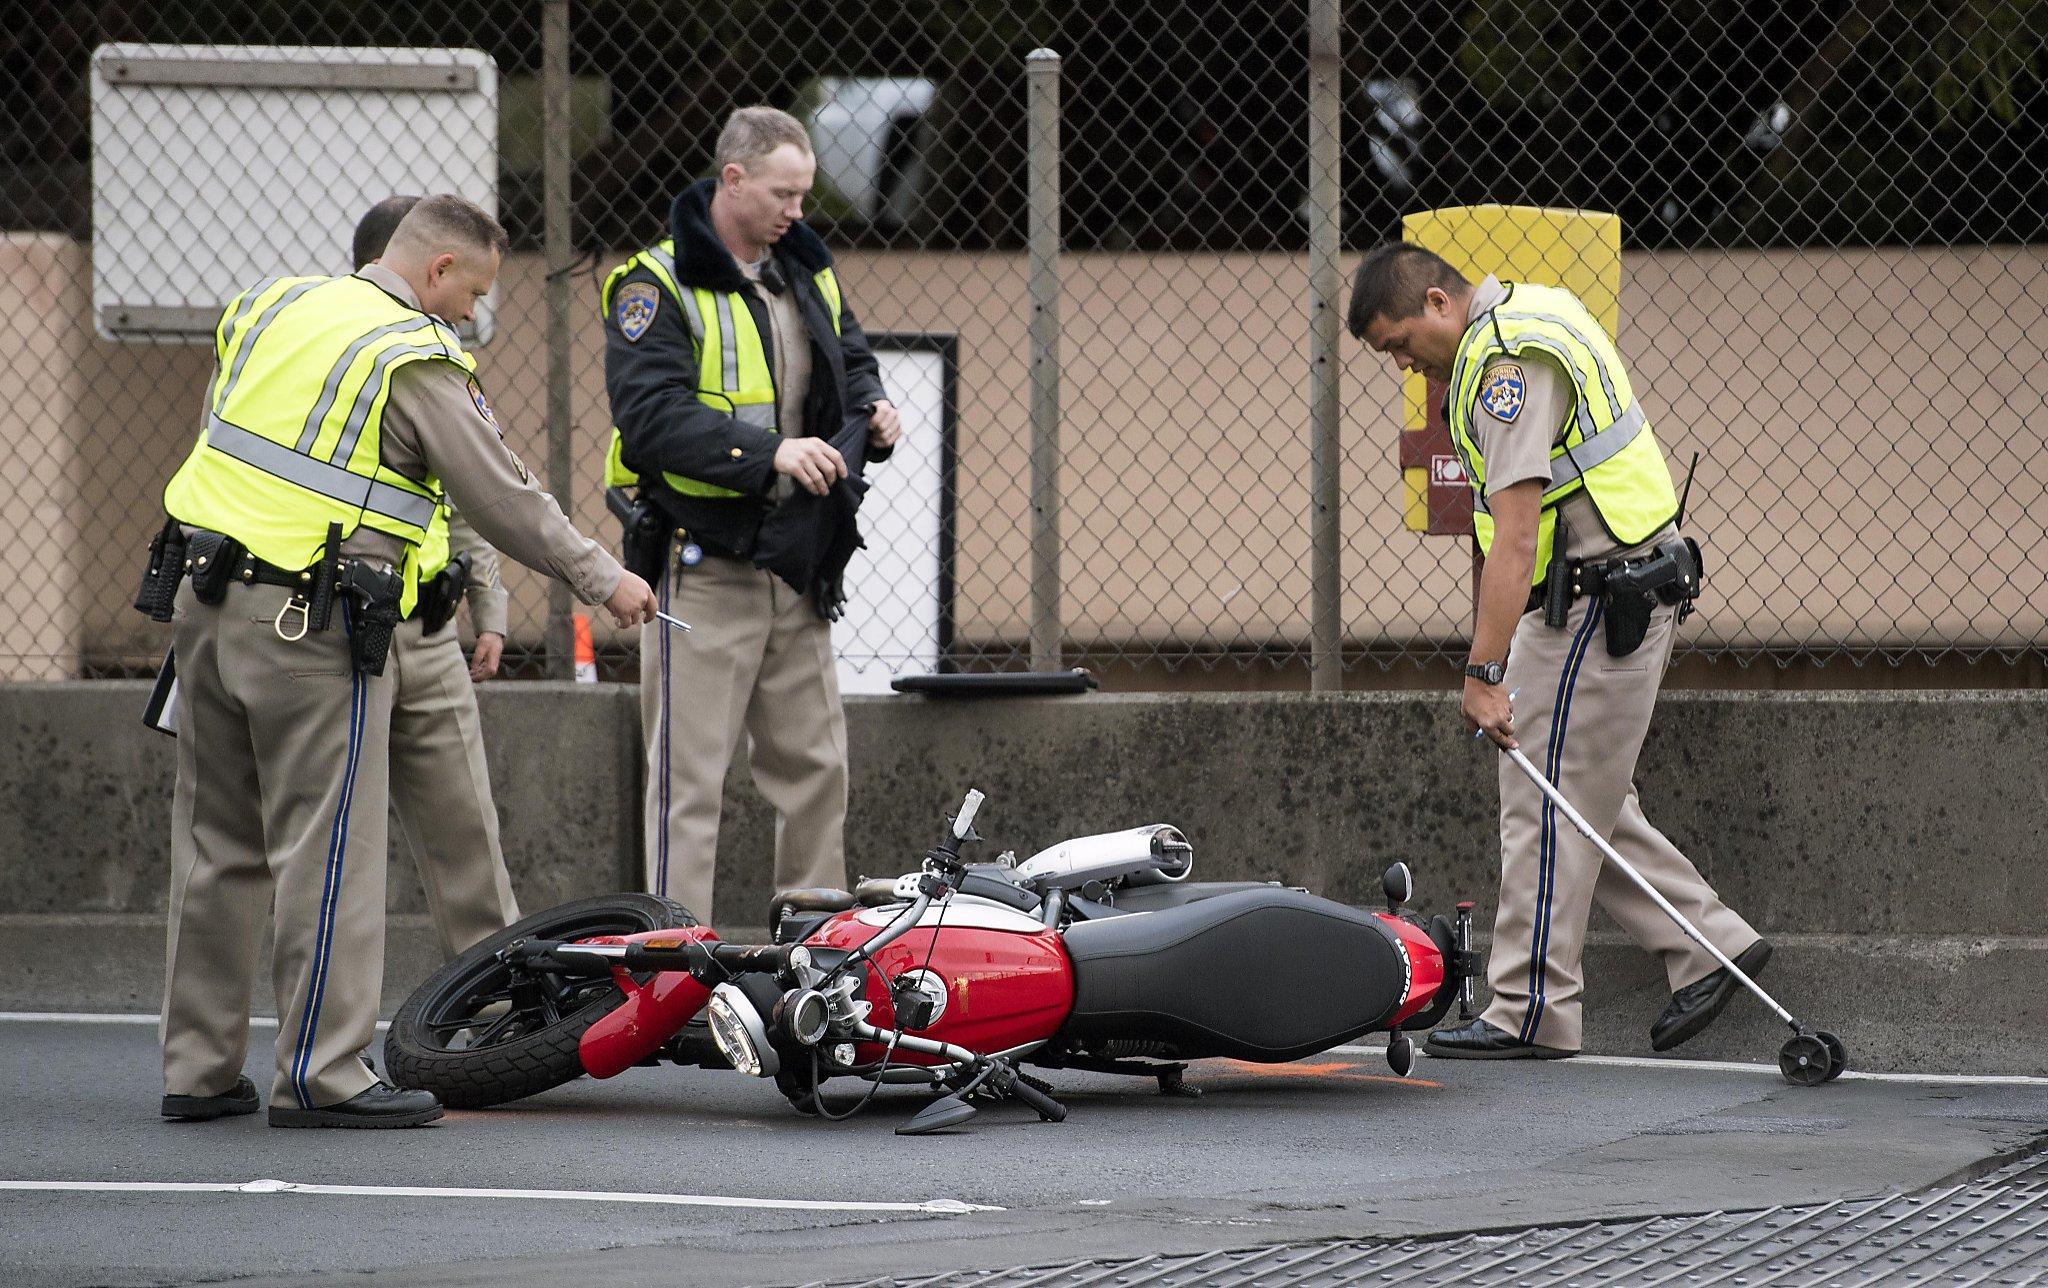 Motorcyclist killed on Golden Gate Bridge was Larkspur man - SFGate